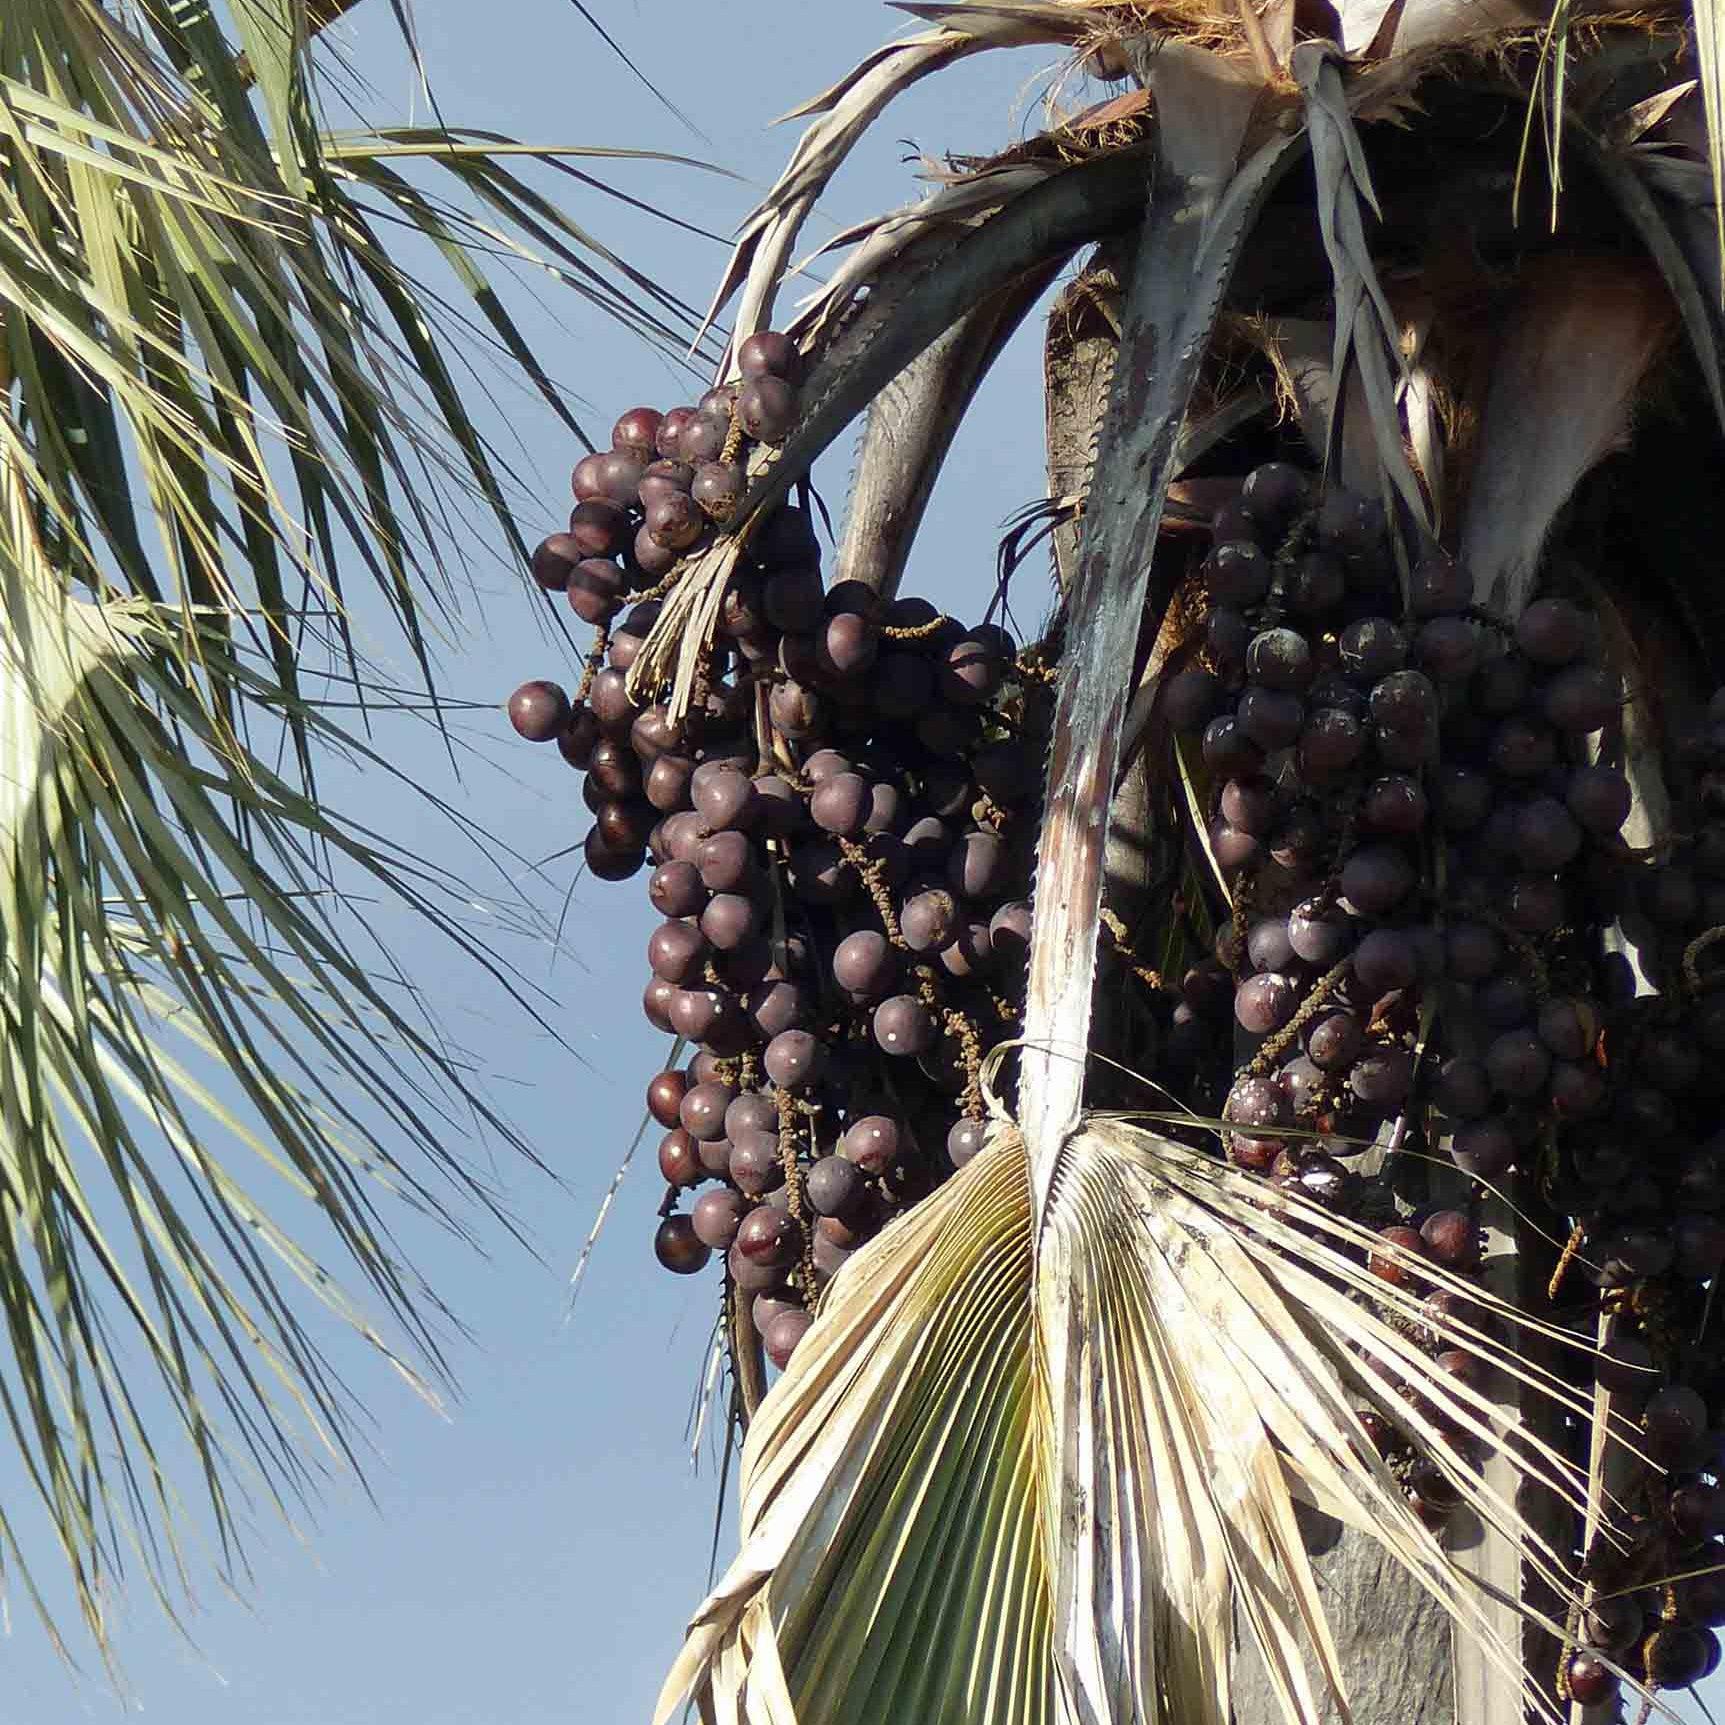 Small black fruits on a palm tree